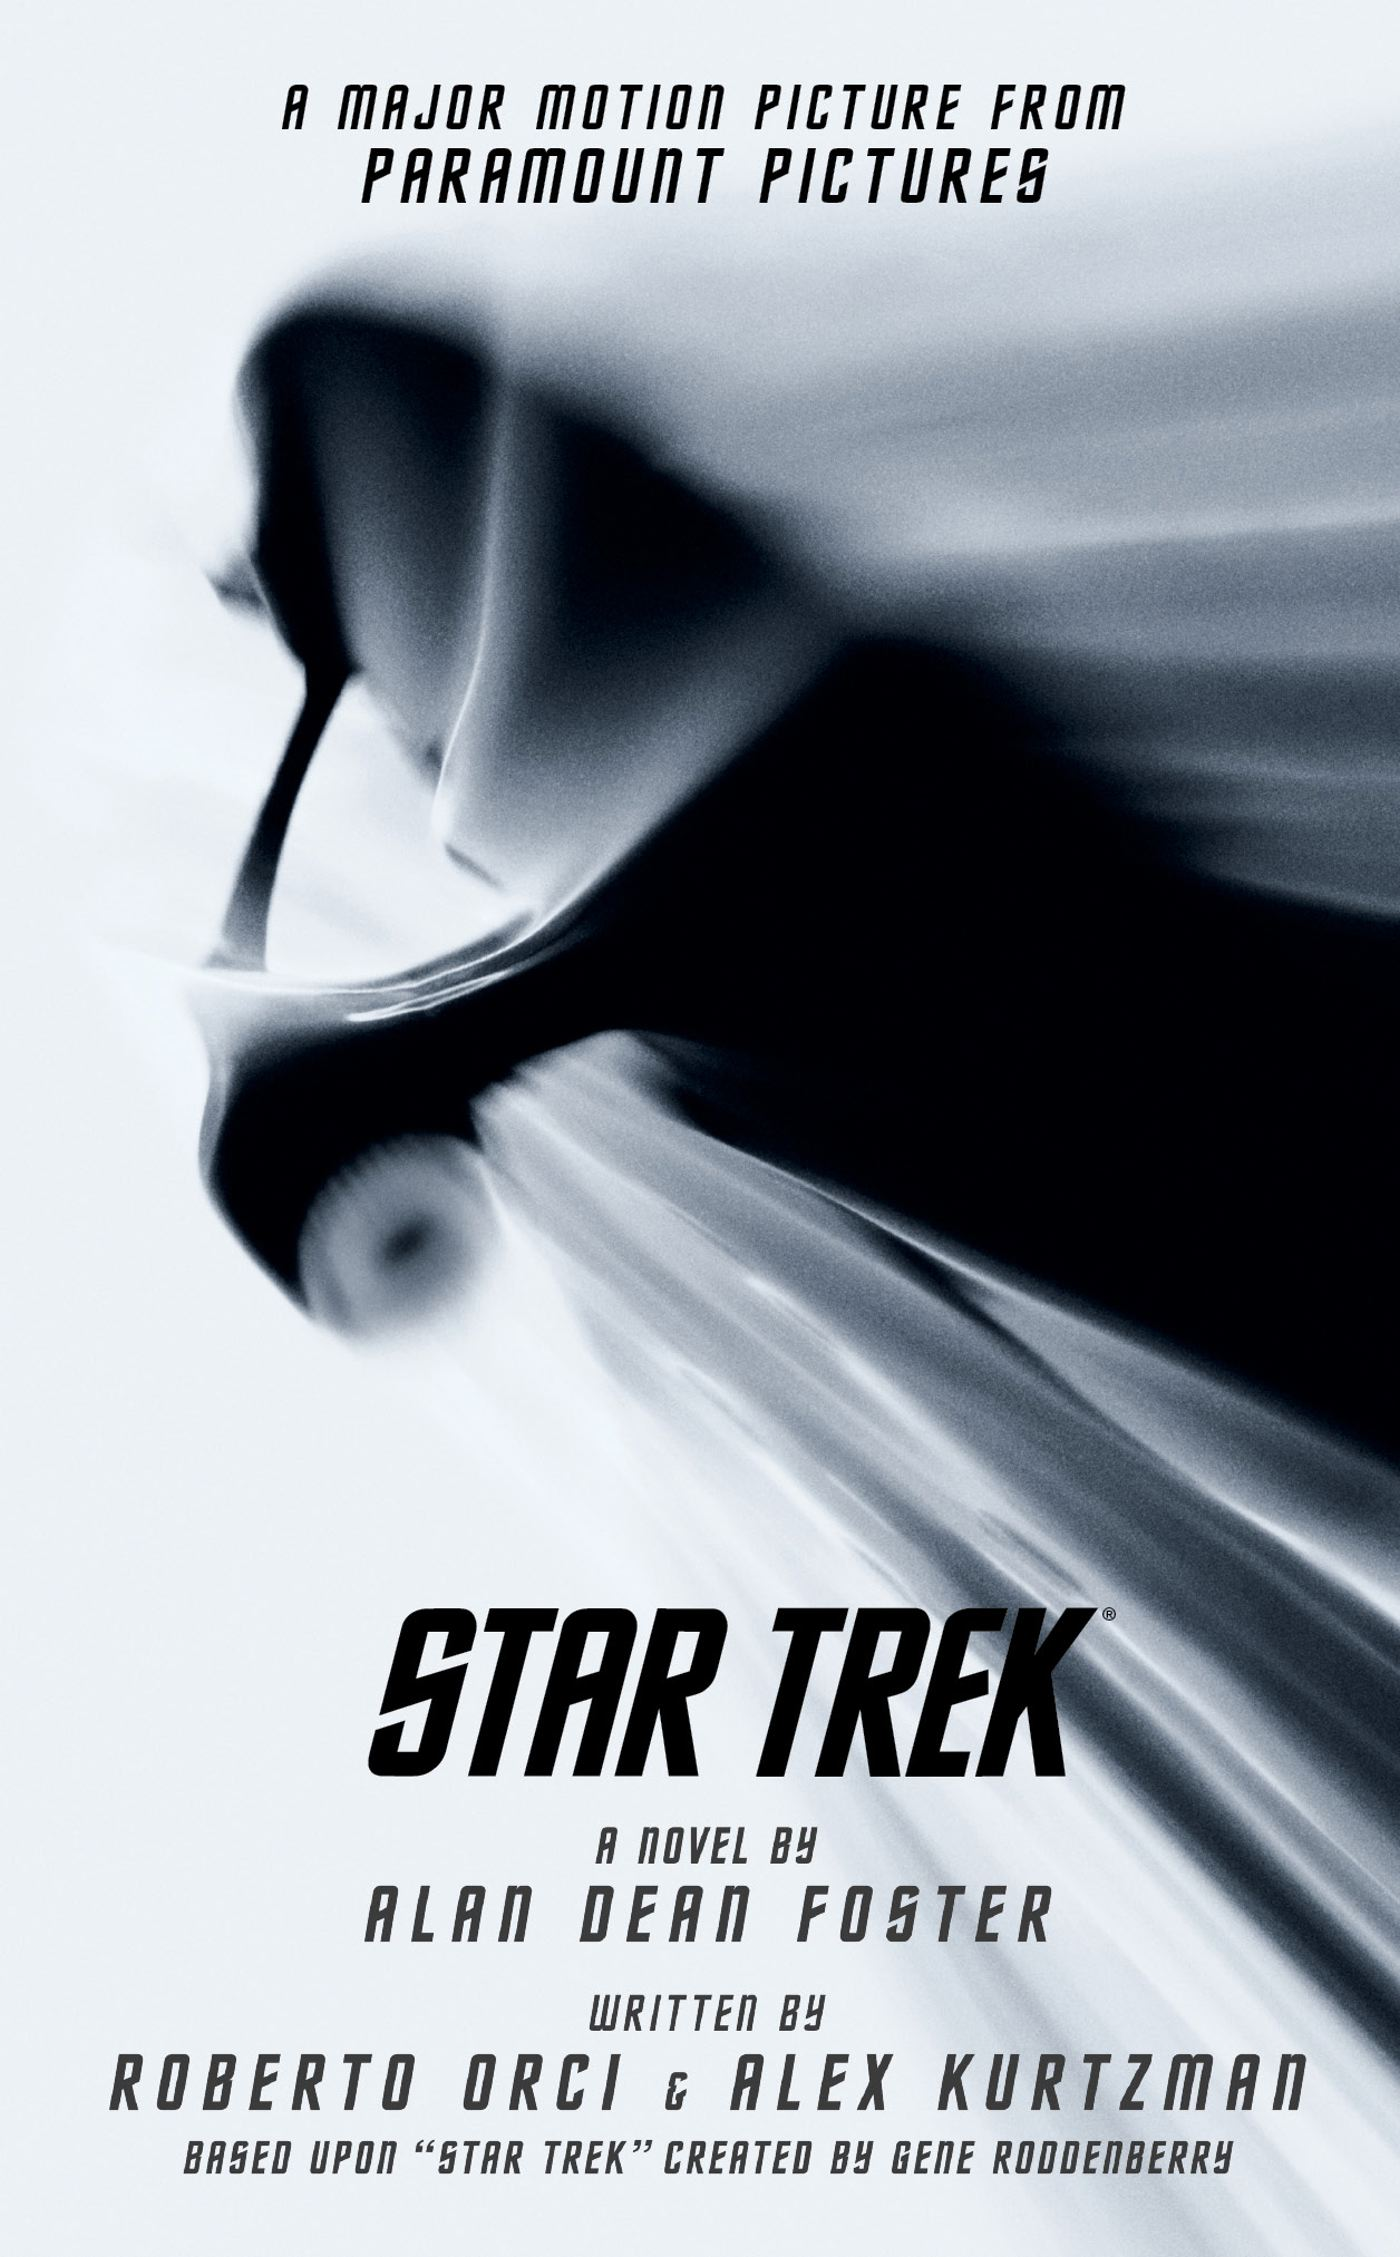 Star trek 2009 original theme 720p chords chordify.